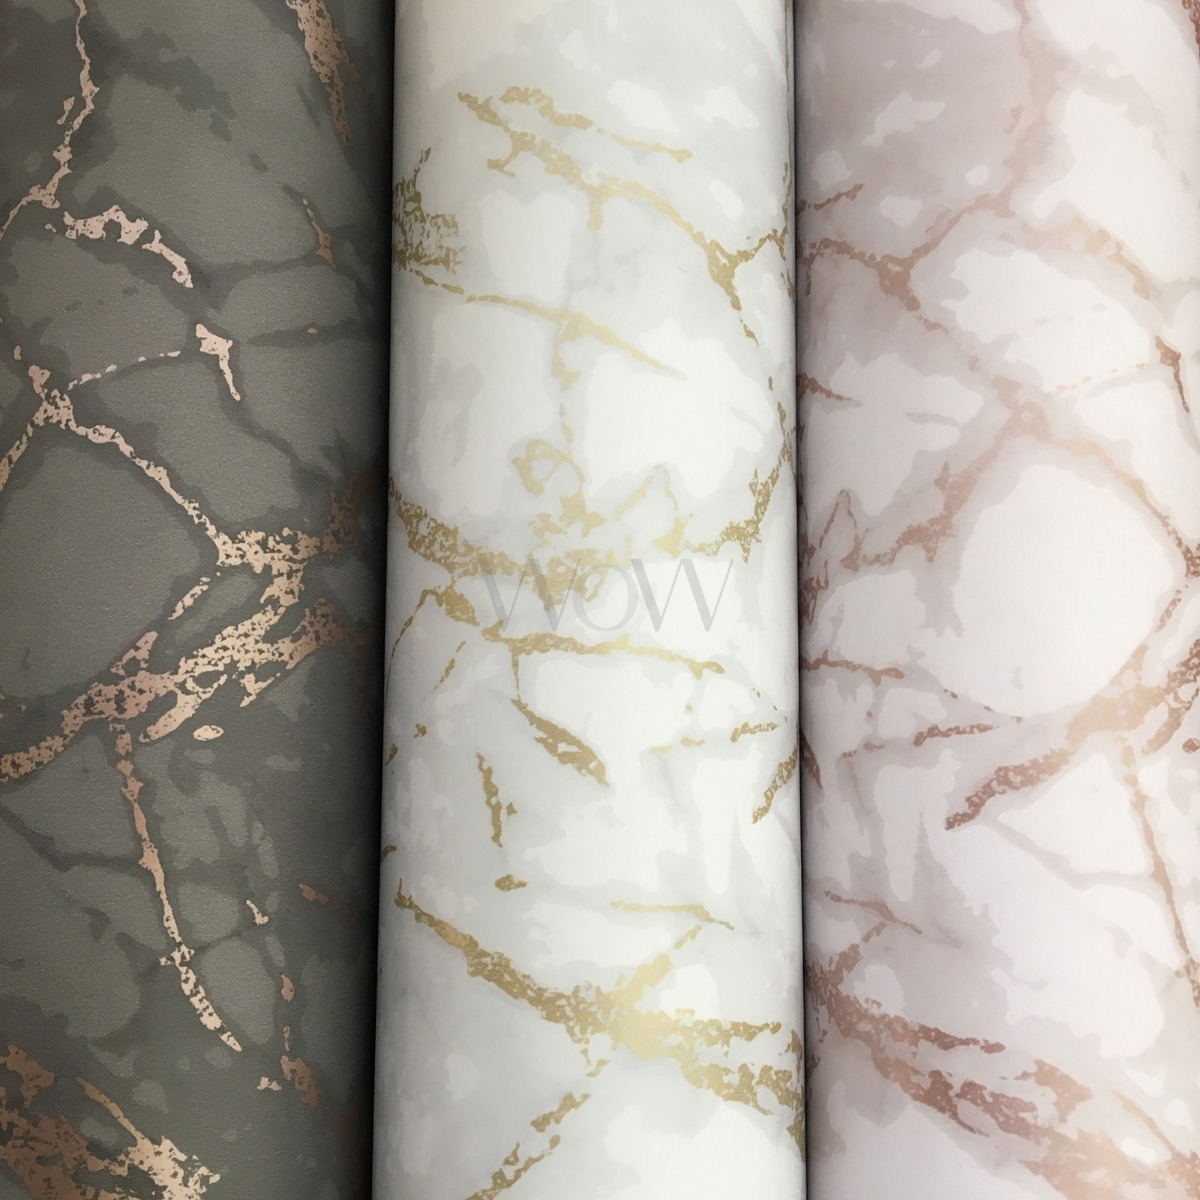 Download Wallpaper Marble Metallic - DEC183-184-185_Marble_Wallpaper_Group_ae1  Trends_93785.jpg